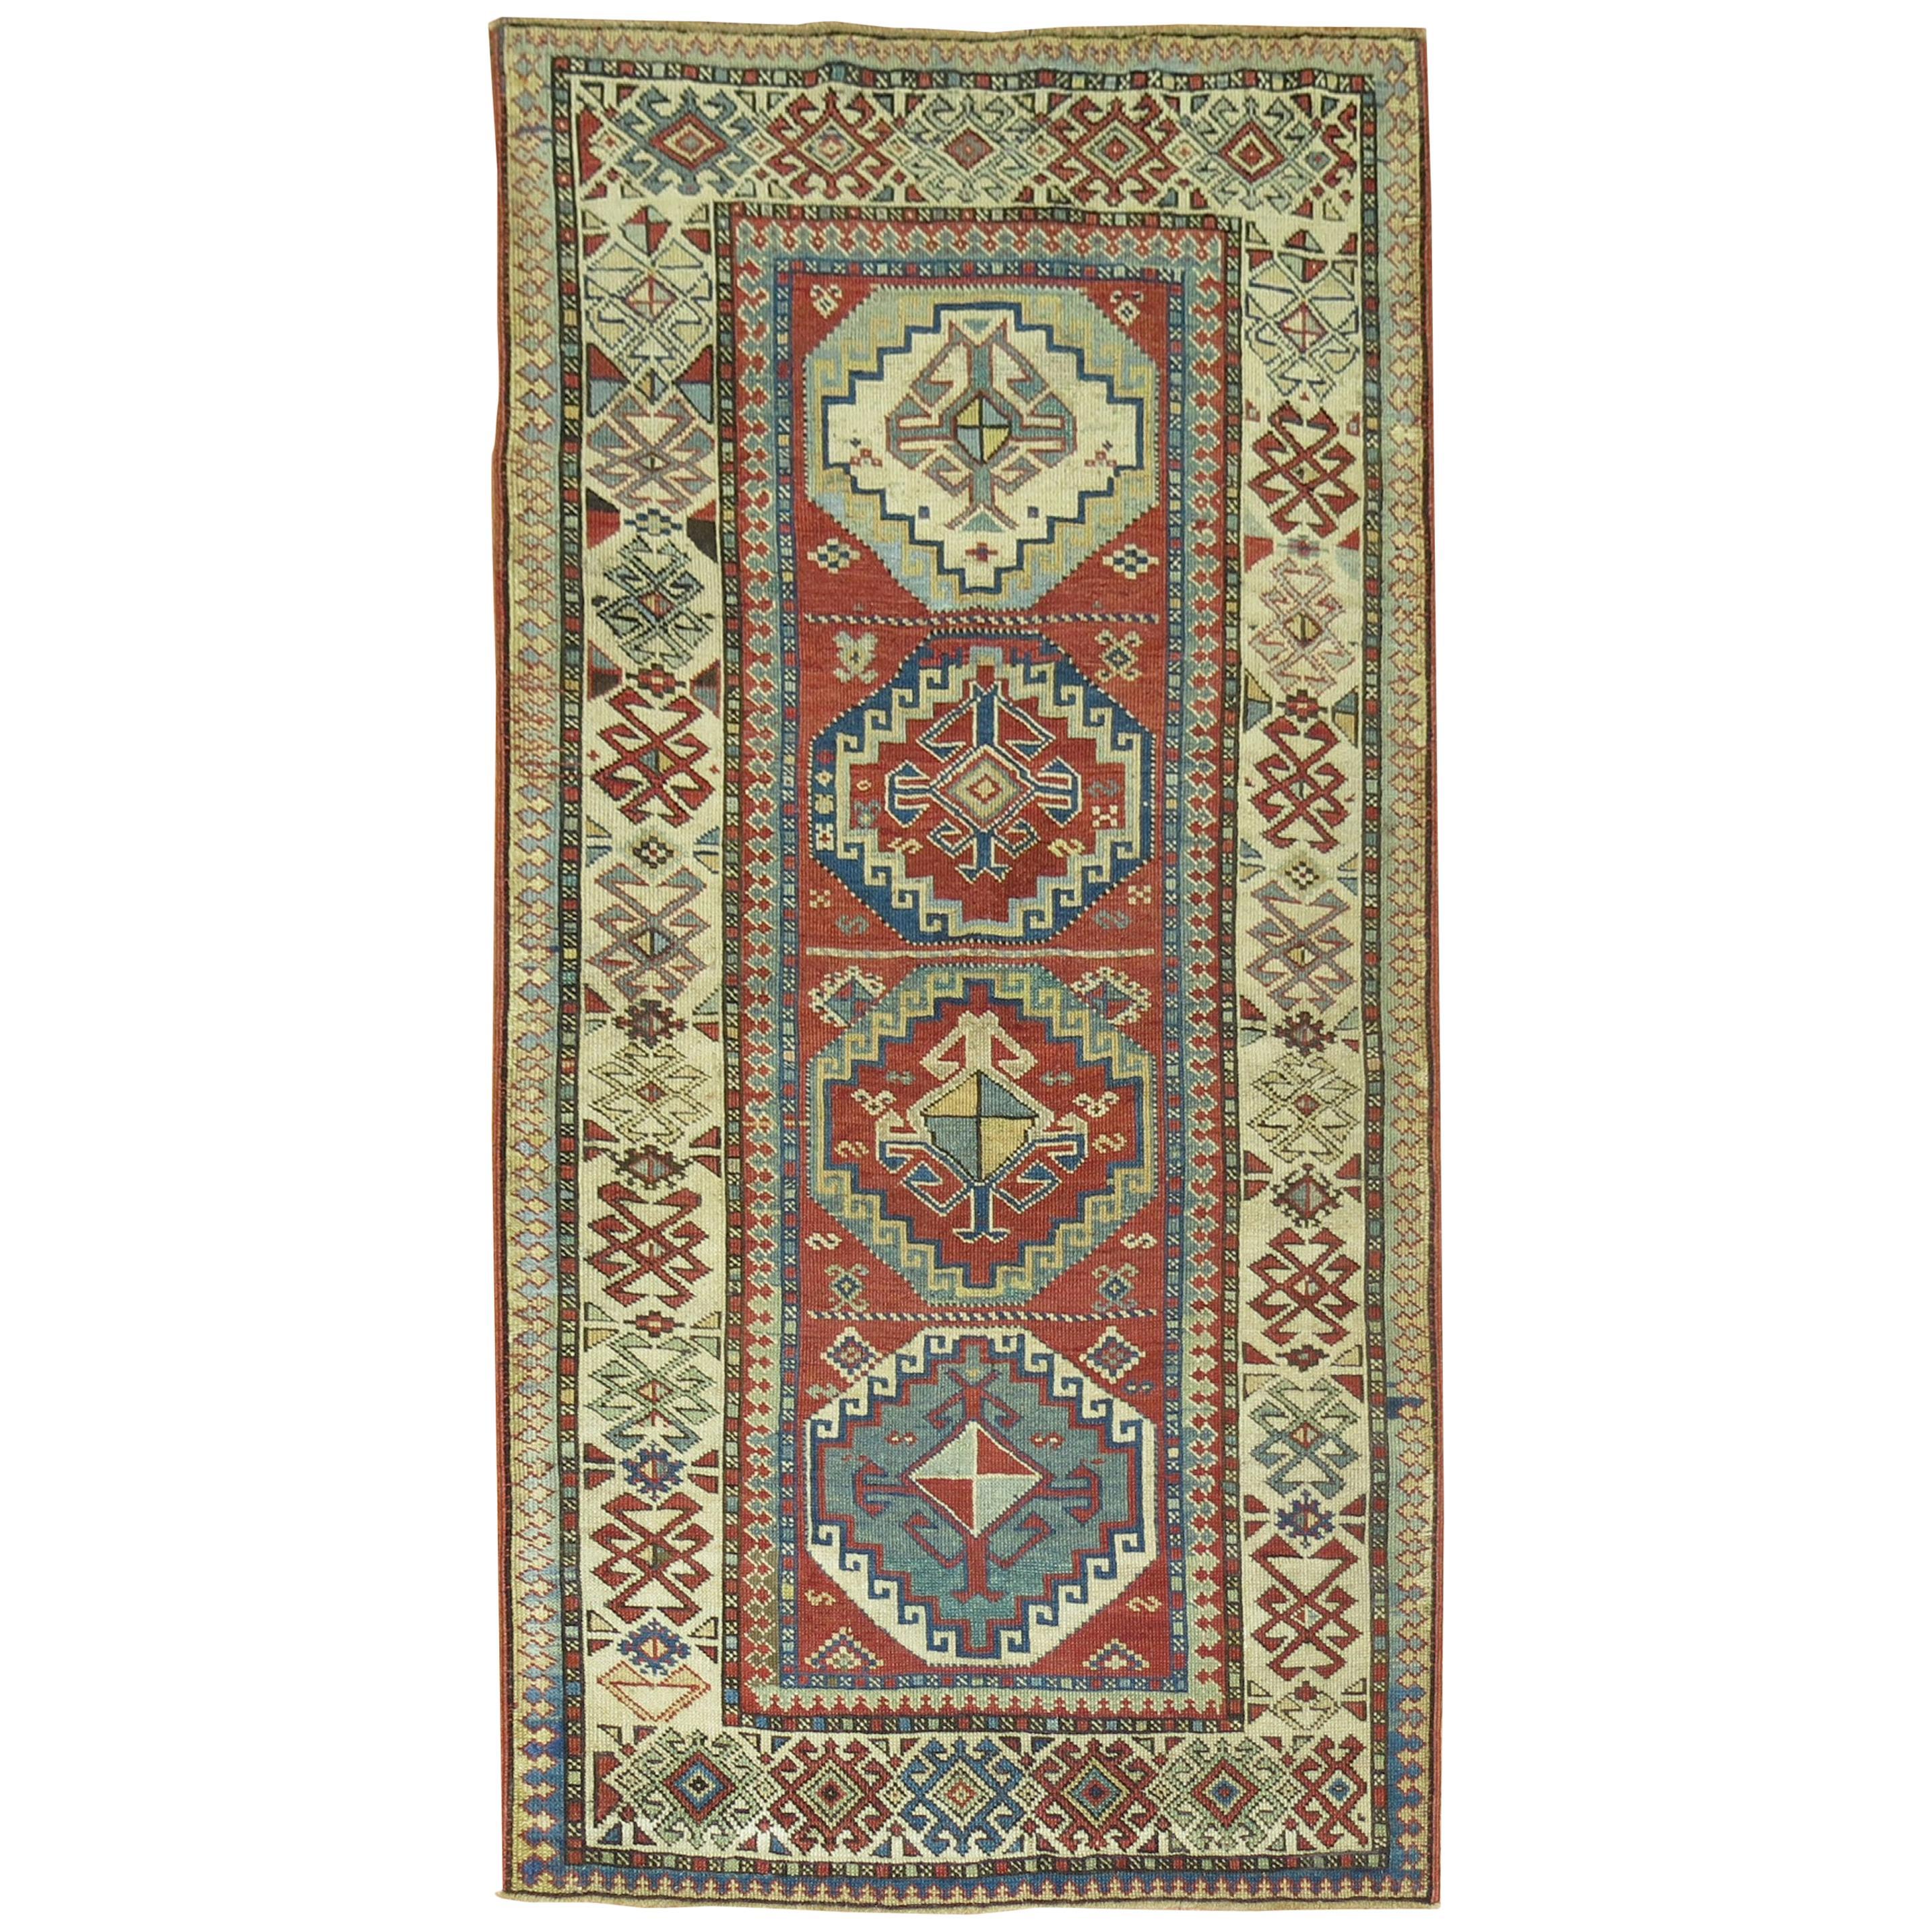 Tribal Geometric Antique Caucasian Shirvan Rug